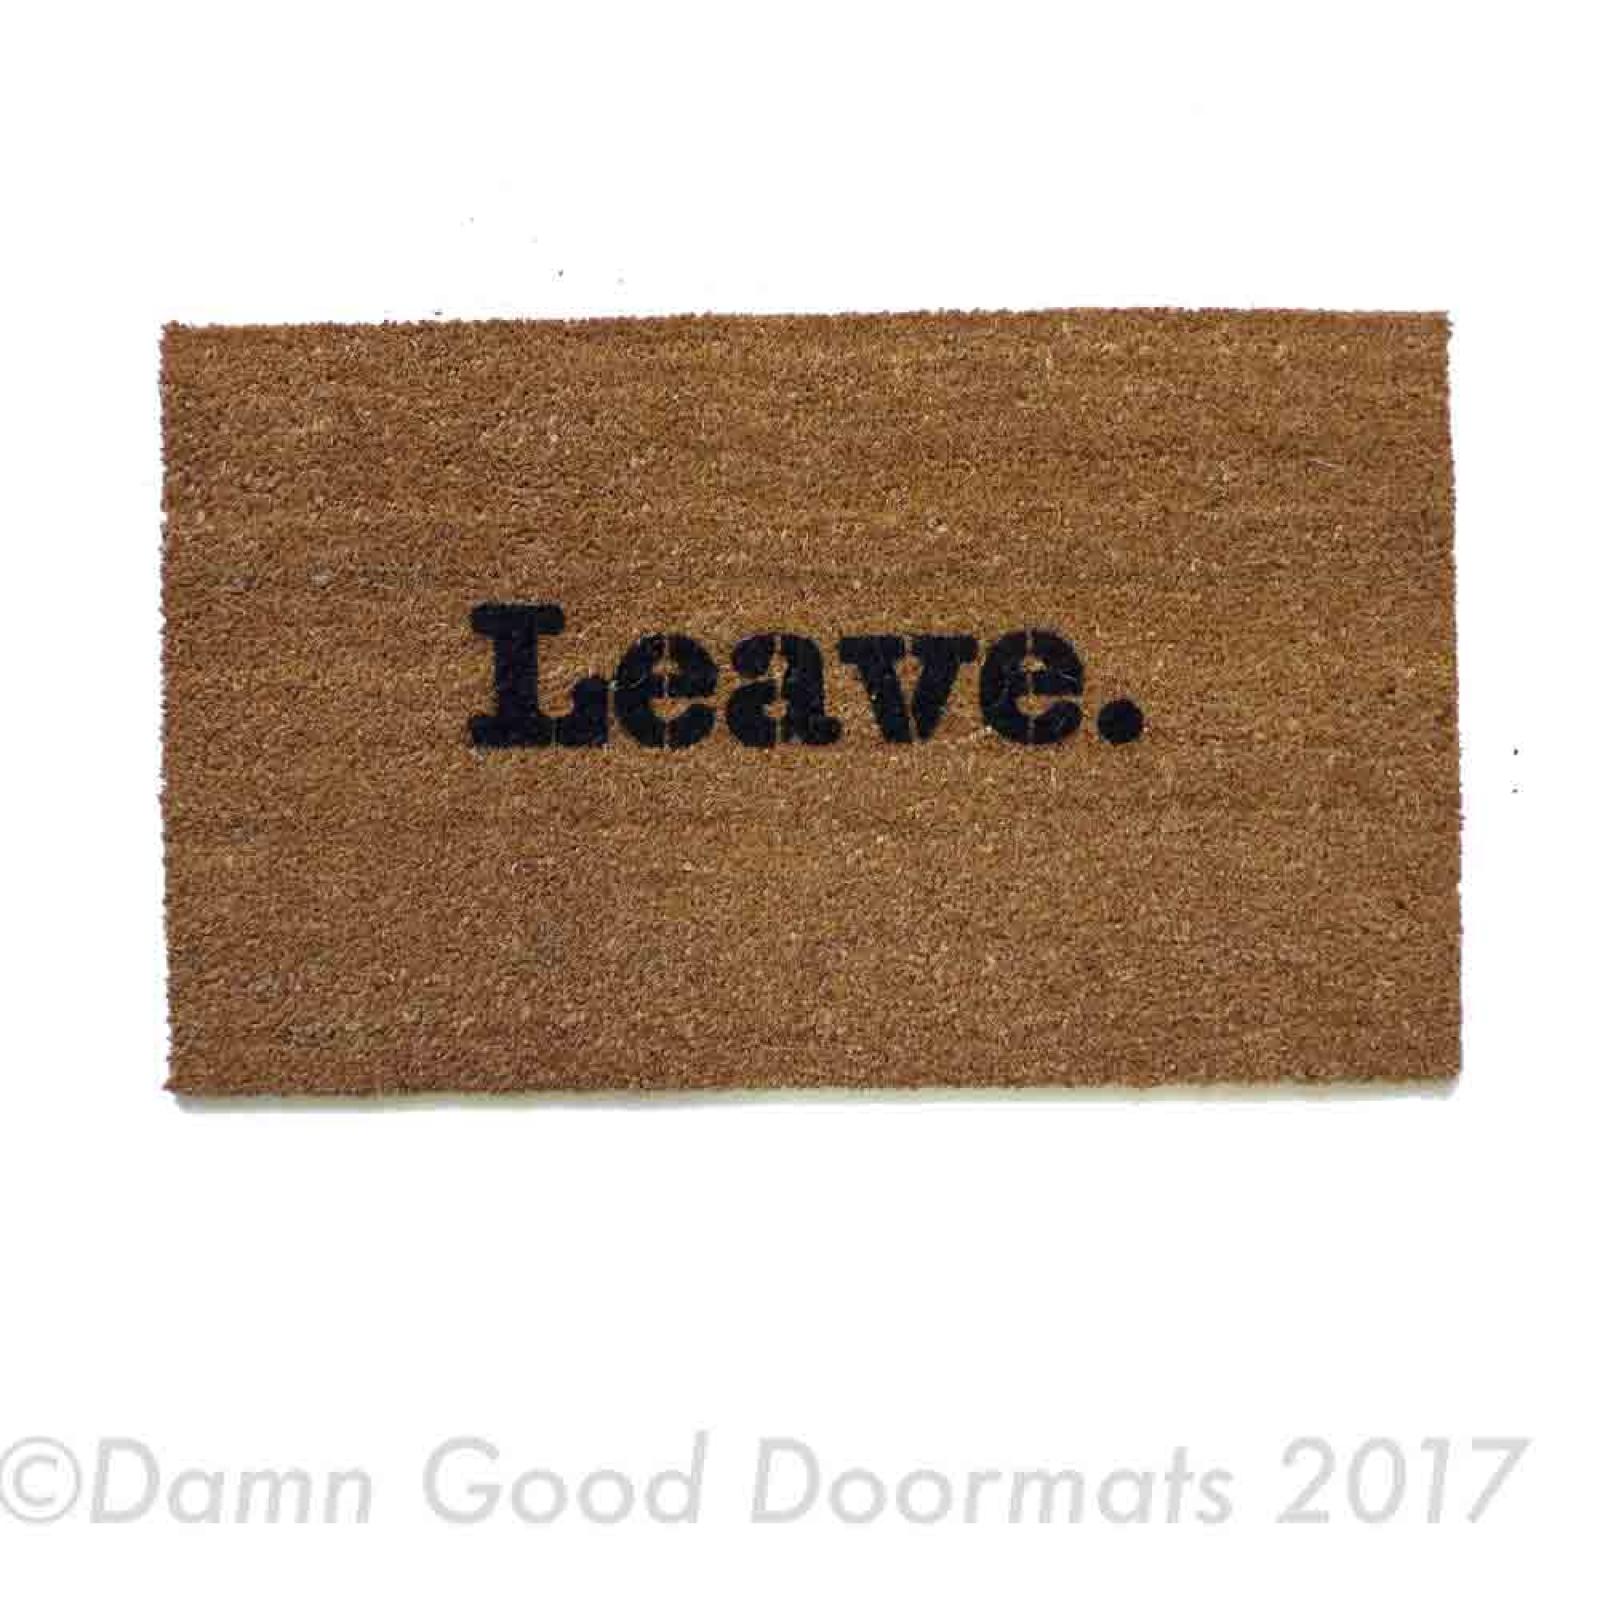 Leave Unwelcome Doormat Funny Rude Mature Novelty